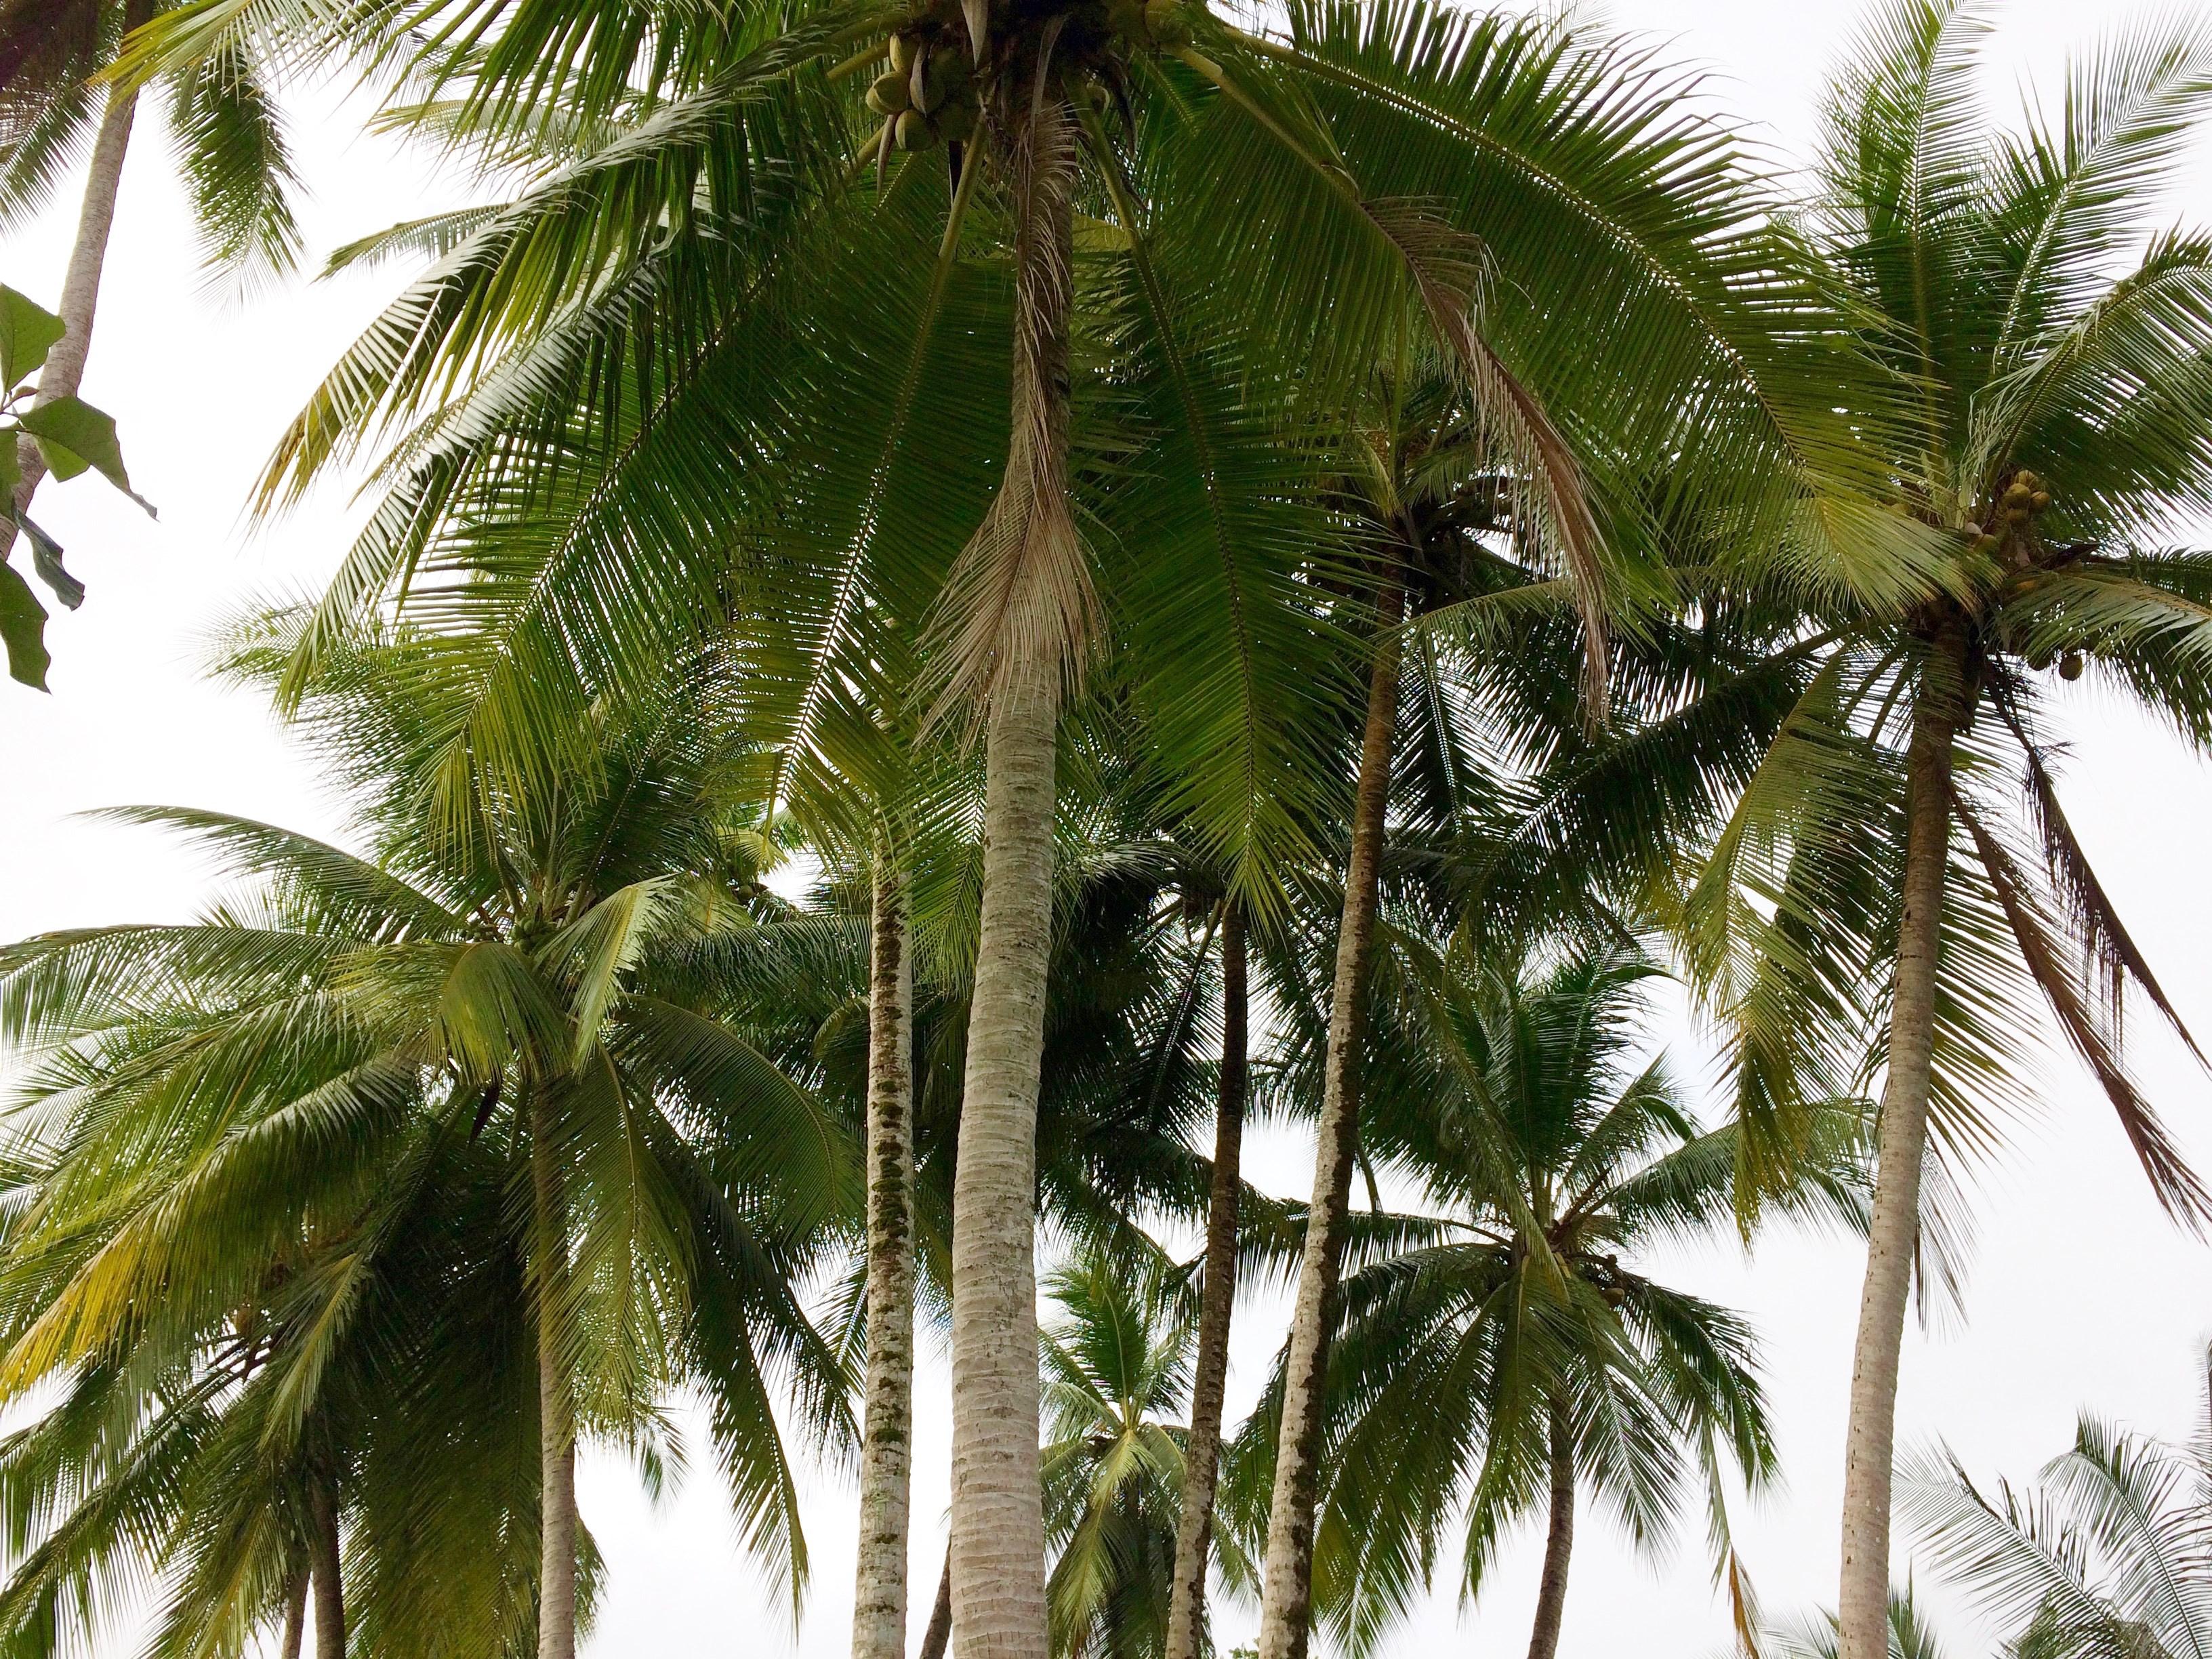 Hooked-on-Panama-Palms Doggy Bliss at Hooked on Panama Panama Pets